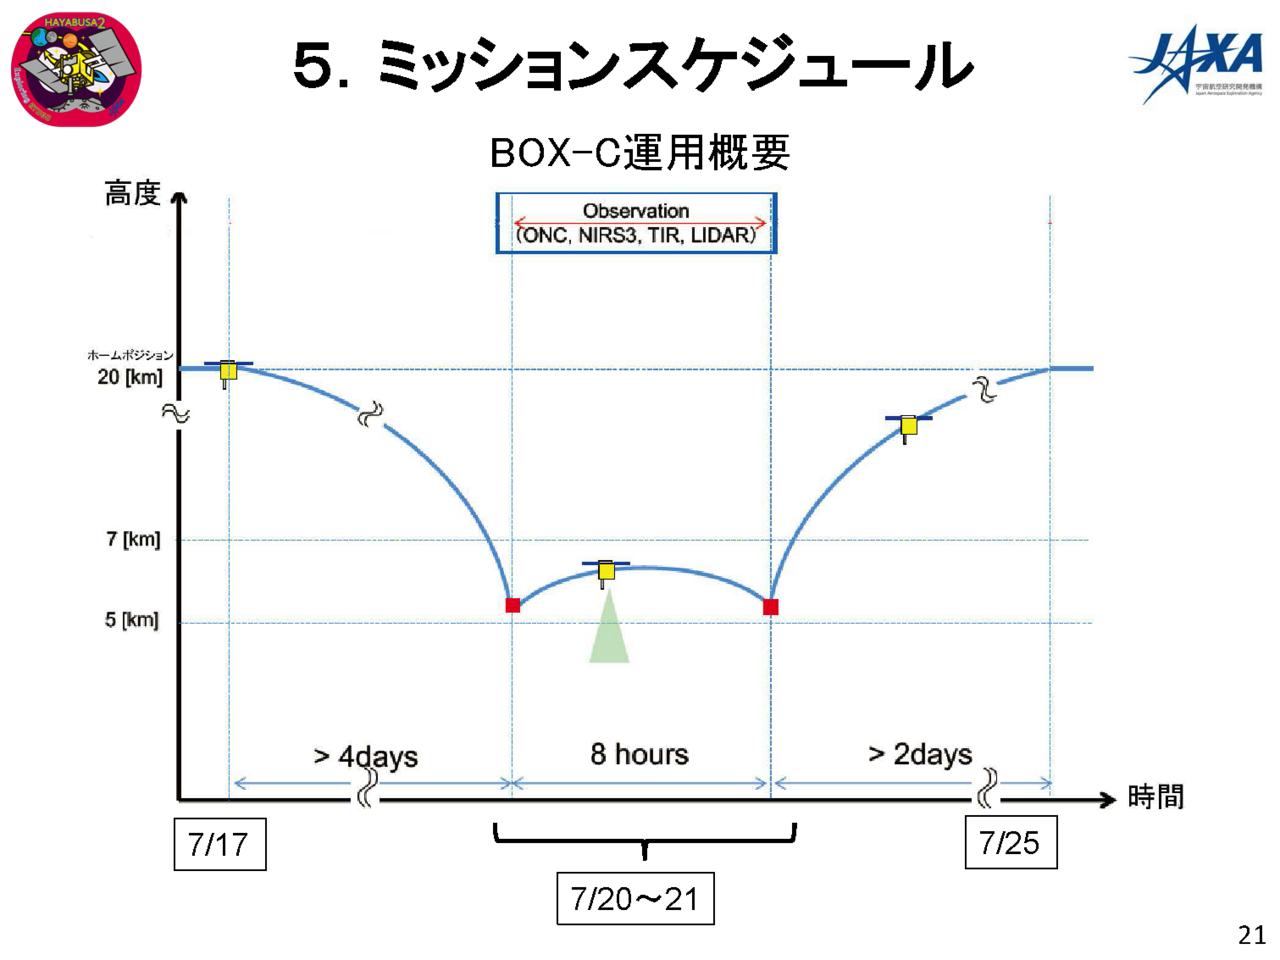 f:id:Imamura:20180802145941p:plain